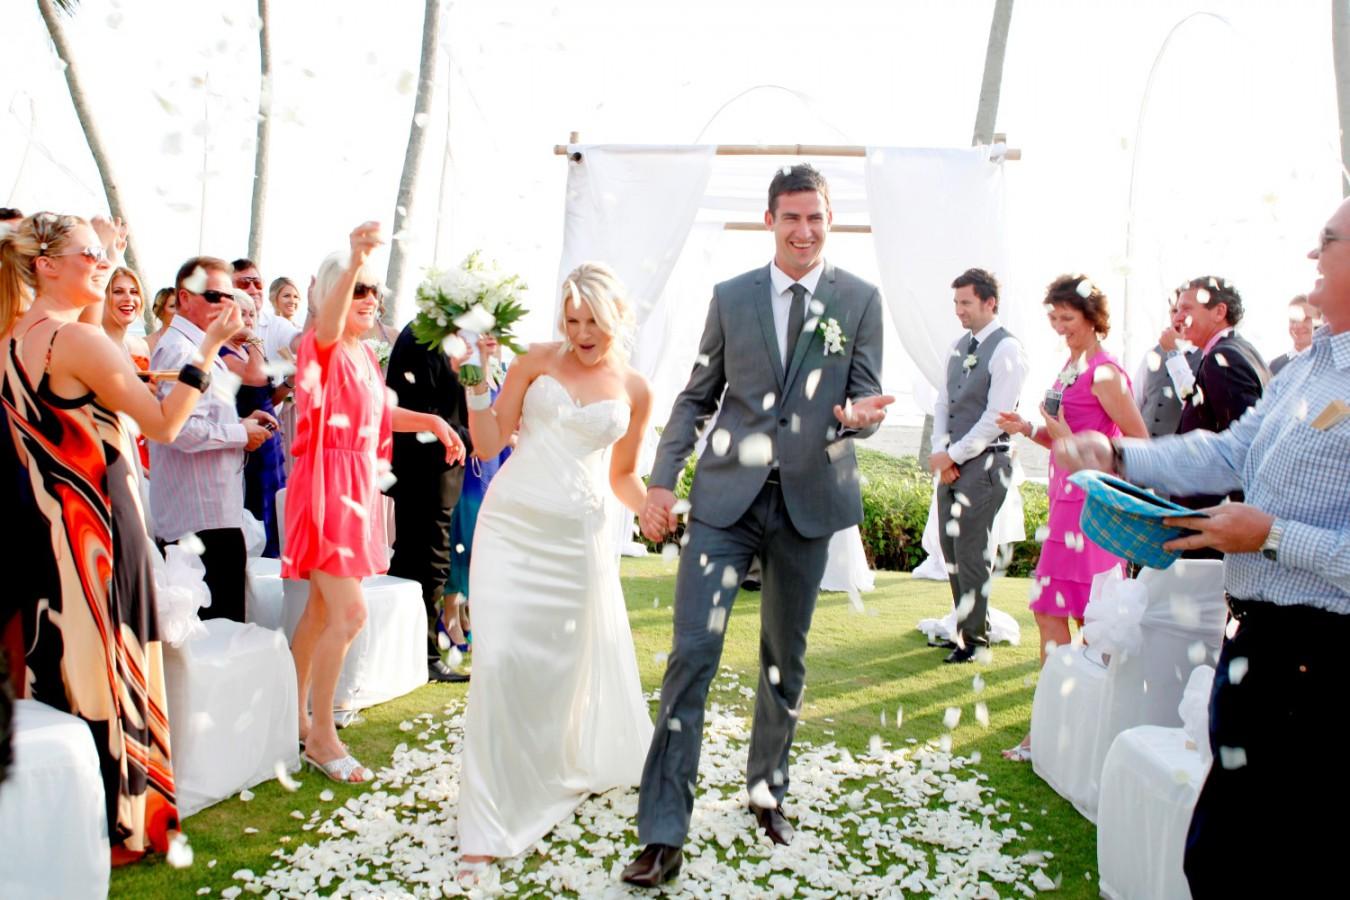 2011.10.16, Megann and Daniel, Ombak Luwung, MJY - Bali Wedding Paradise (20)